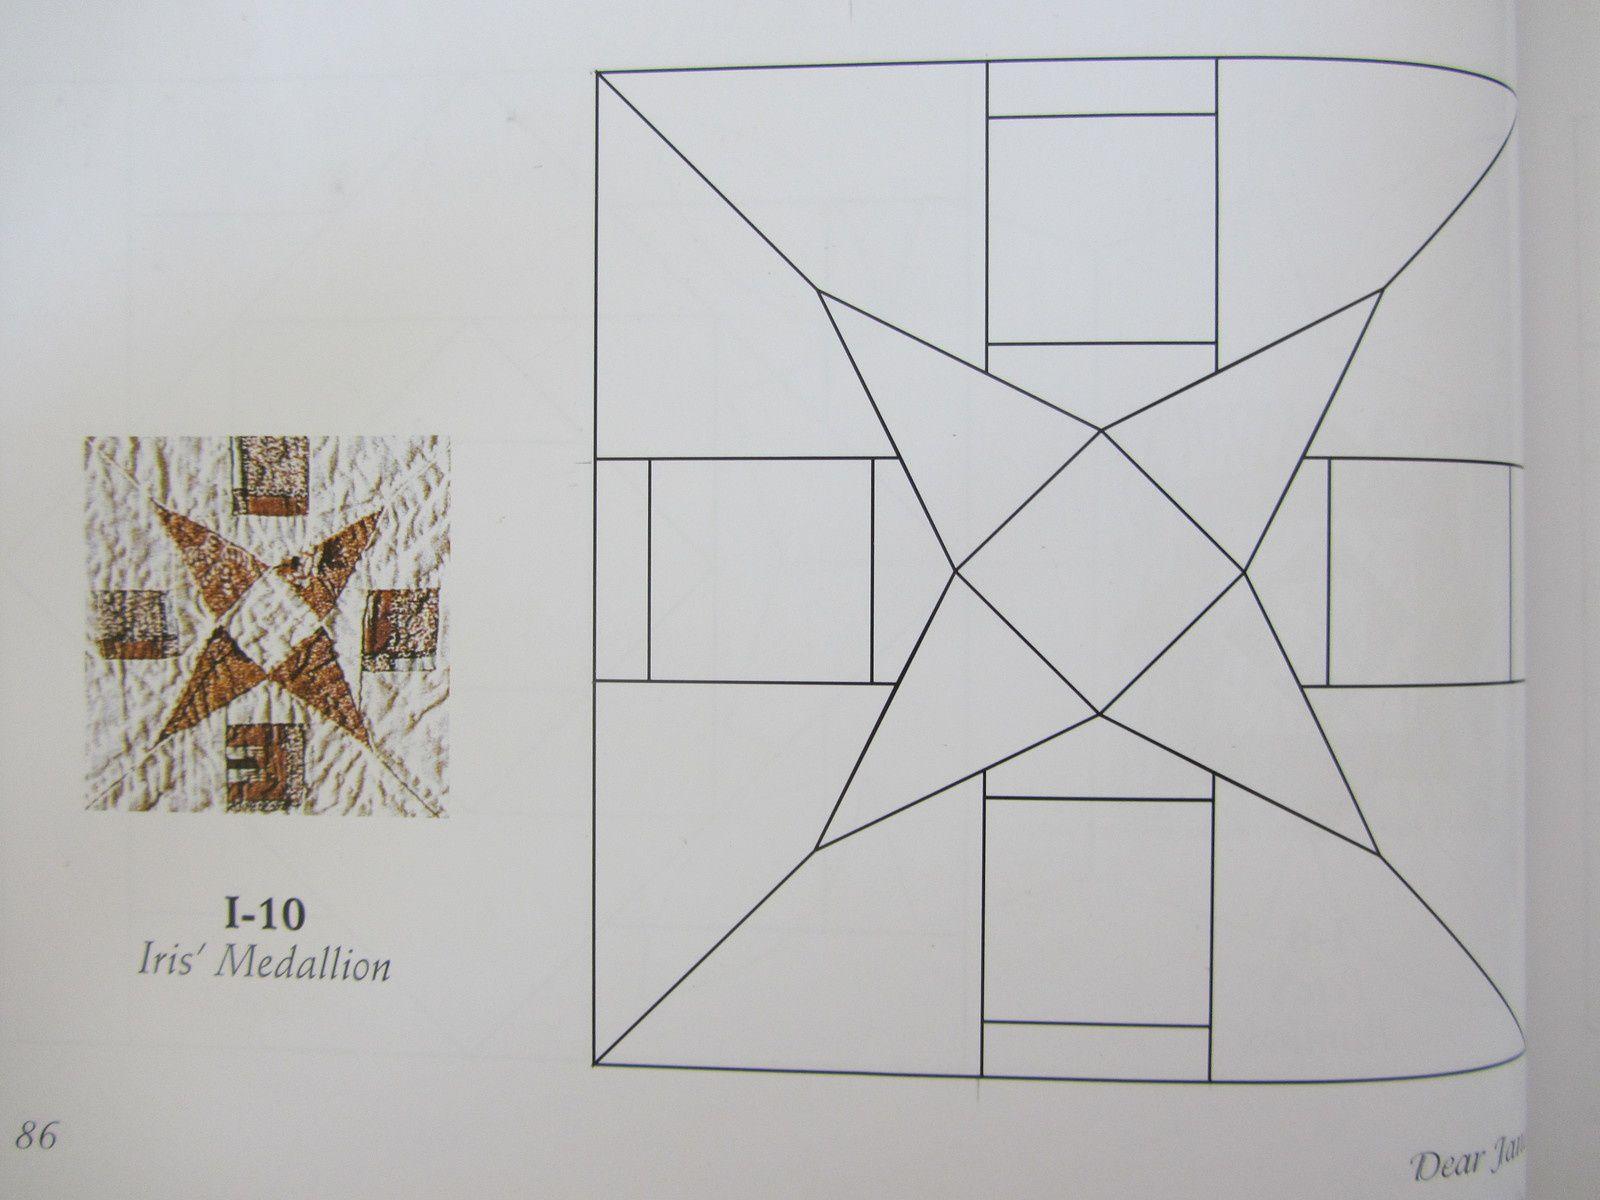 I10 Iris's medaillion